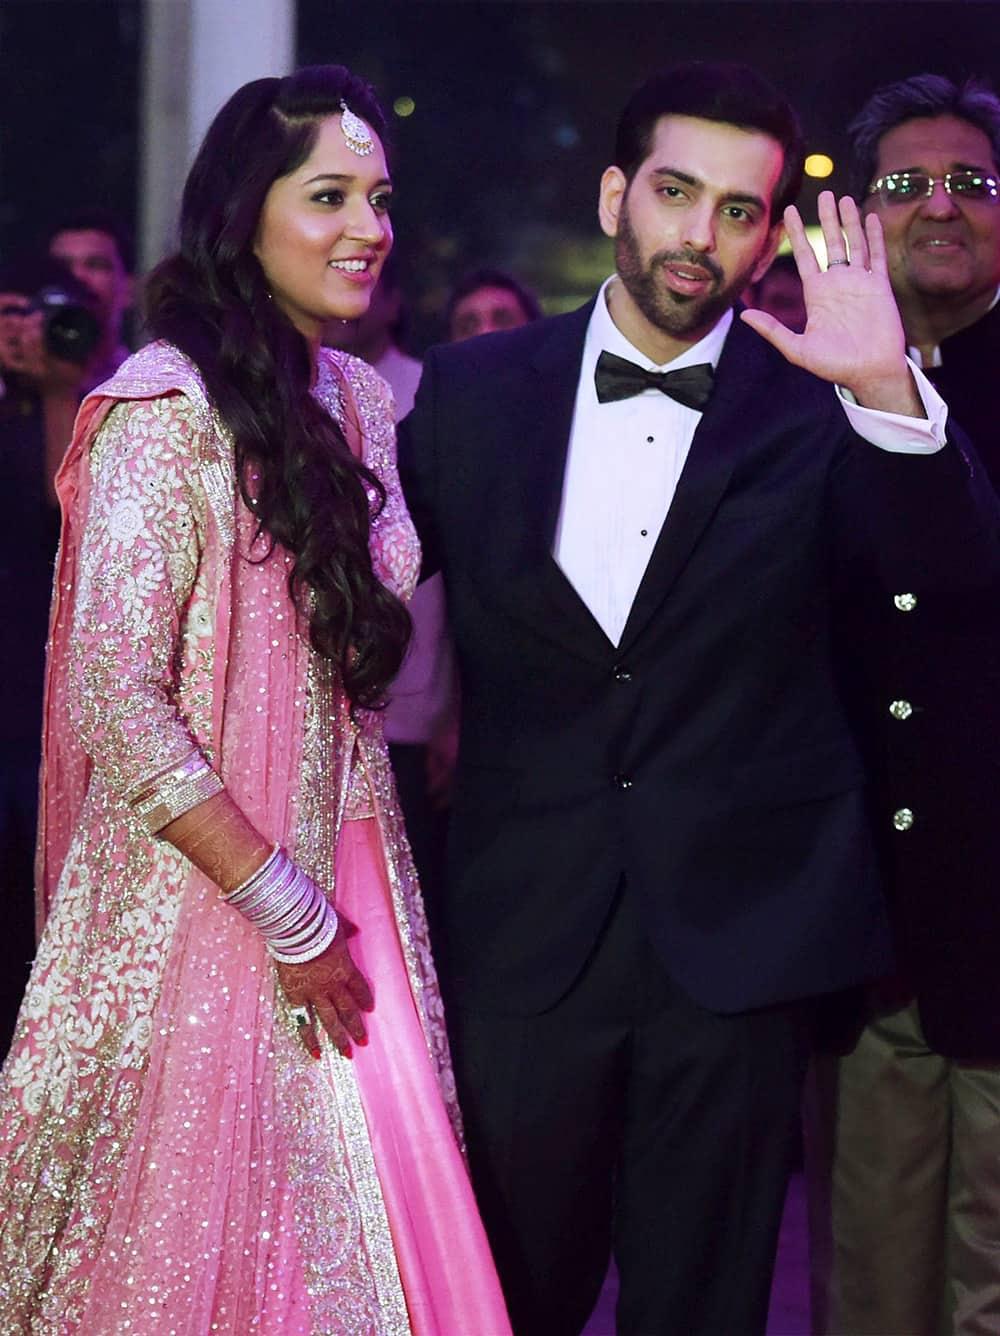 Shatrughan Sinhas son Kussh and Taruna Agarwal during their wedding reception in Mumbai.